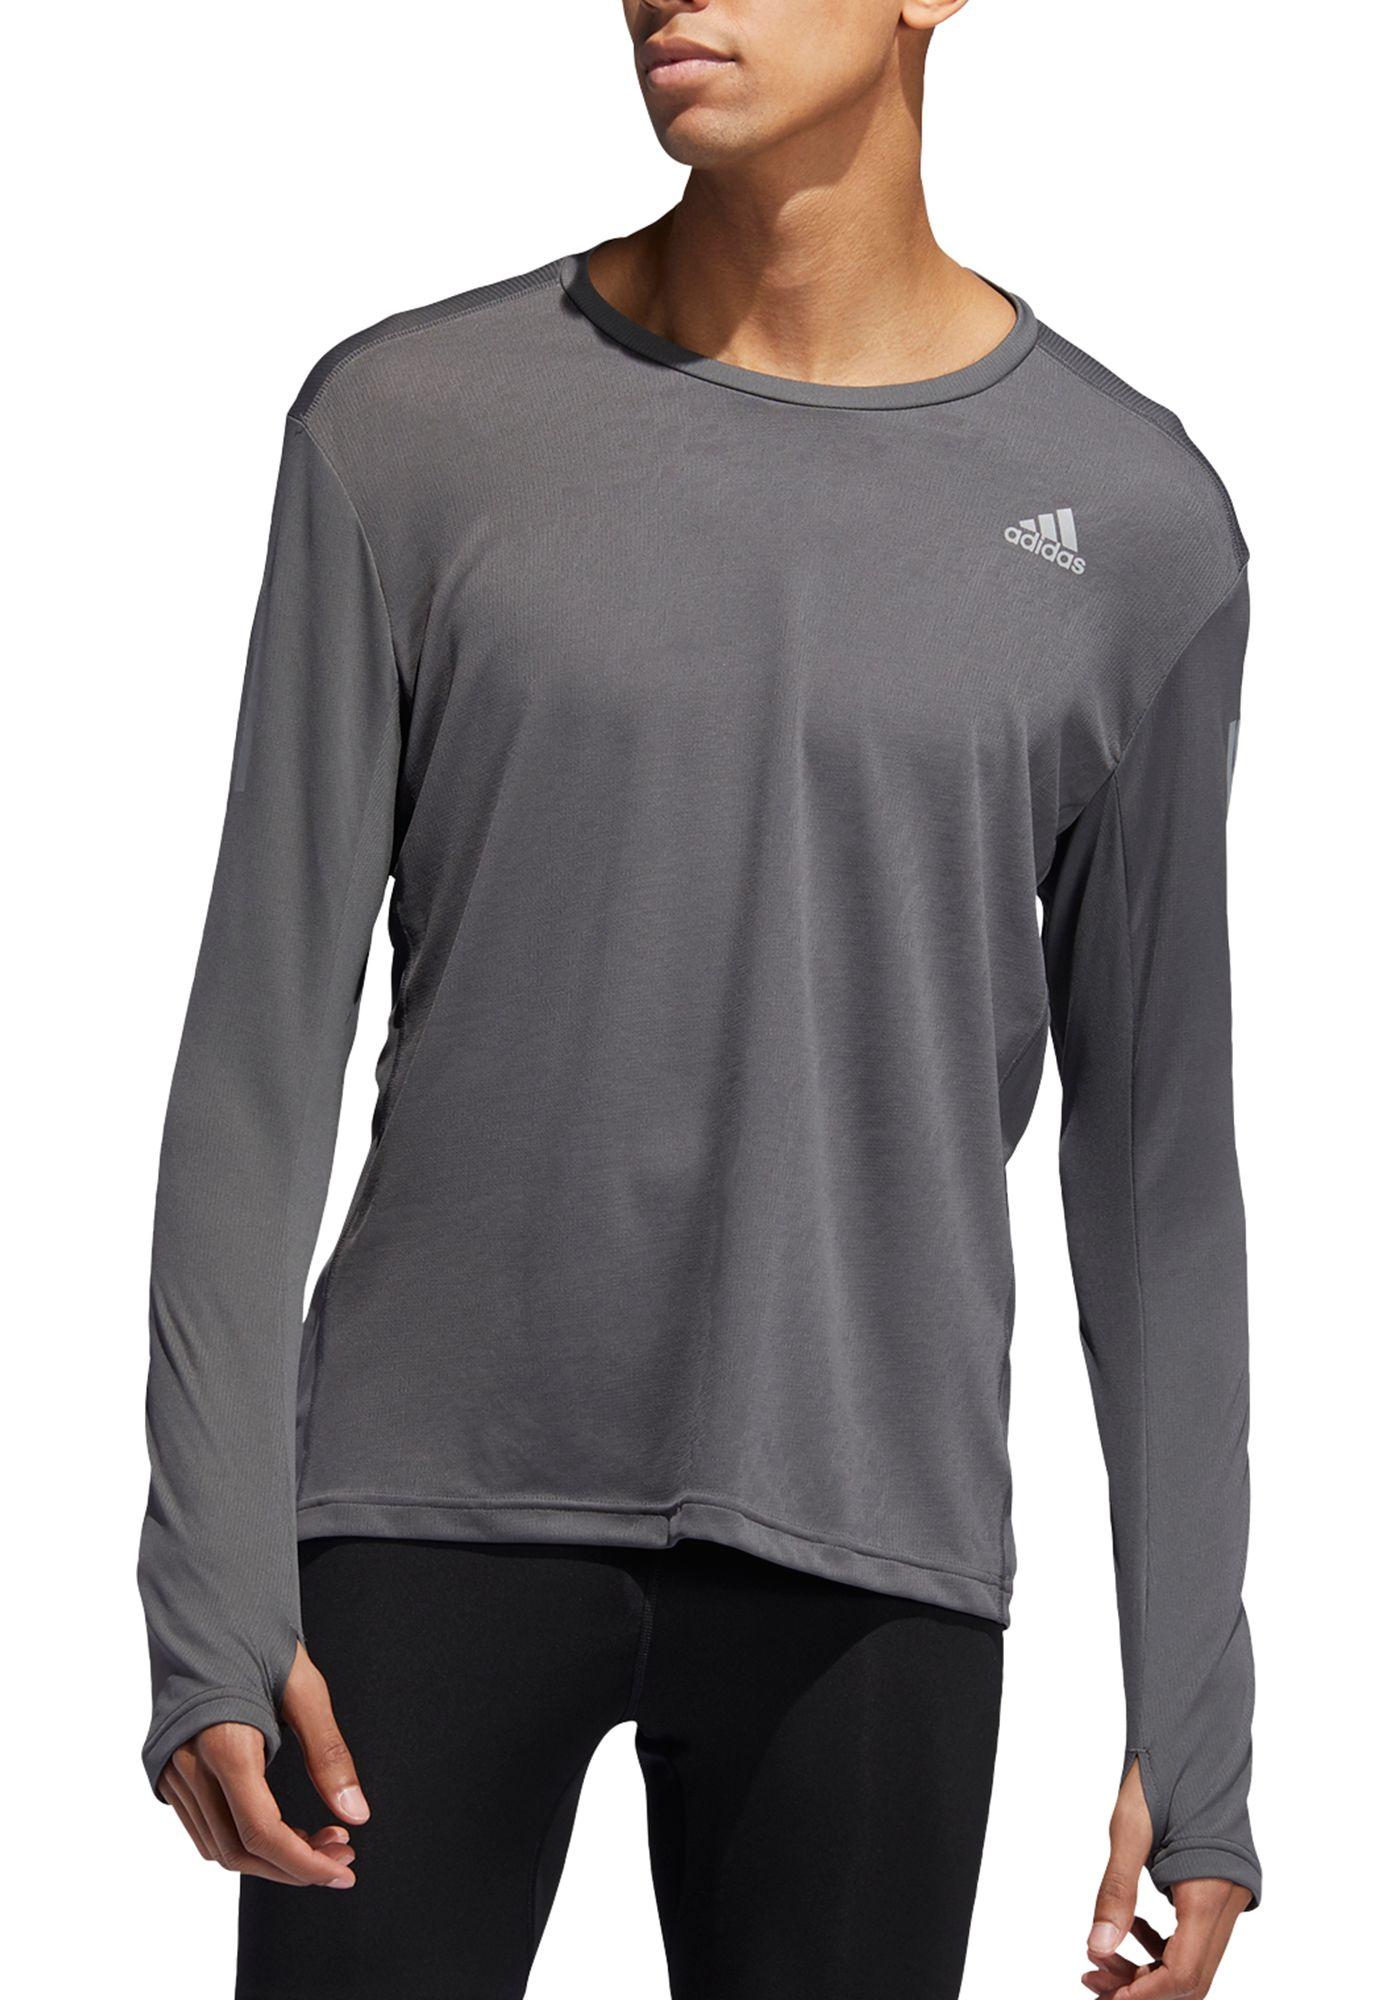 adidas Men's Own the Run Long Sleeve shirt